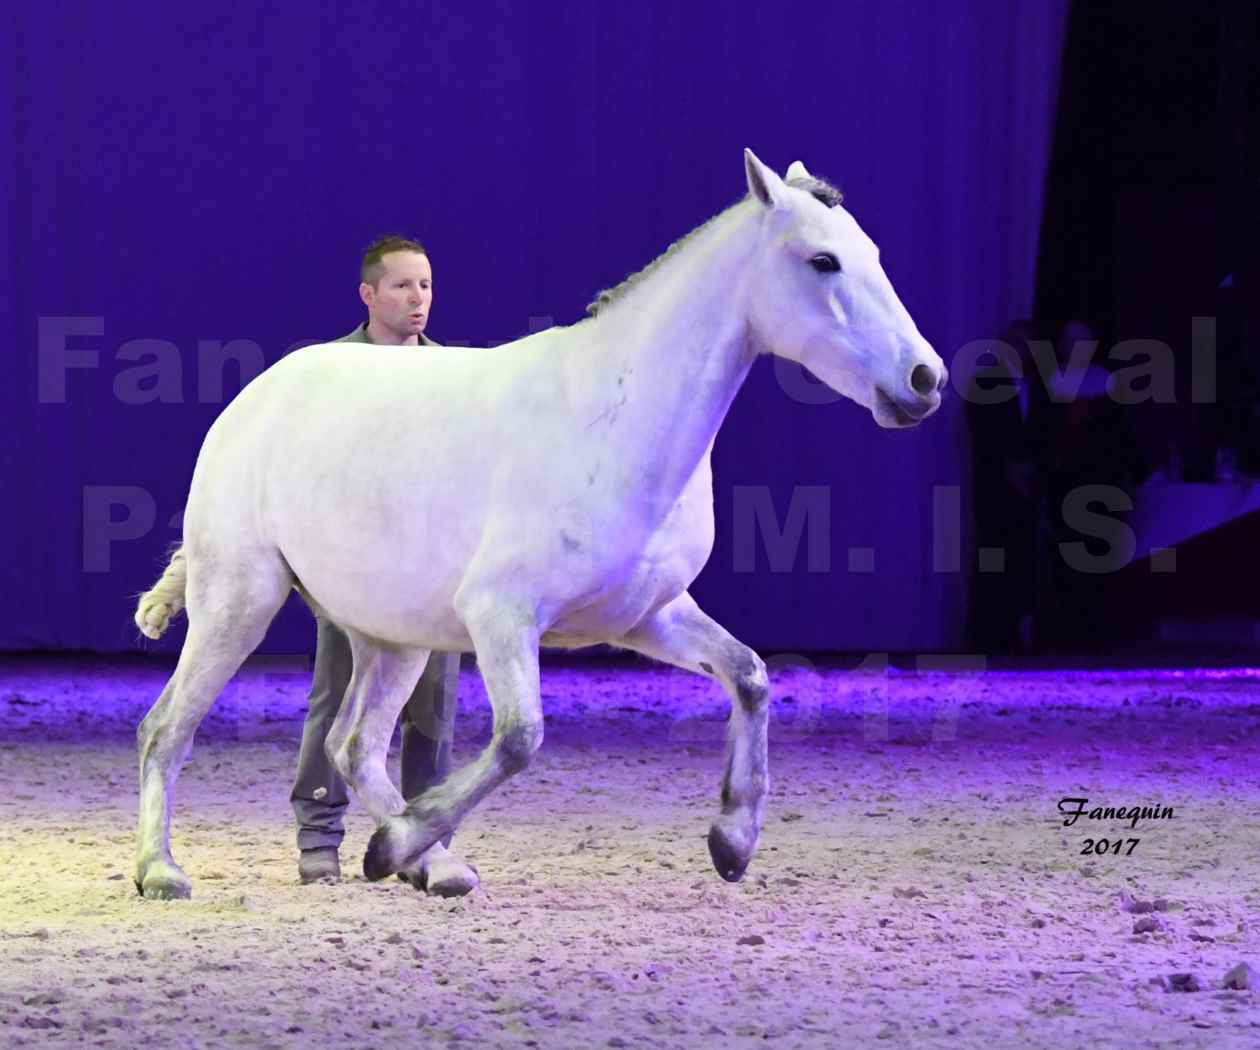 Cheval Passion 2017 - M. I. S. E. C. - Ludovic LONGO & 1 cheval en liberté - 02